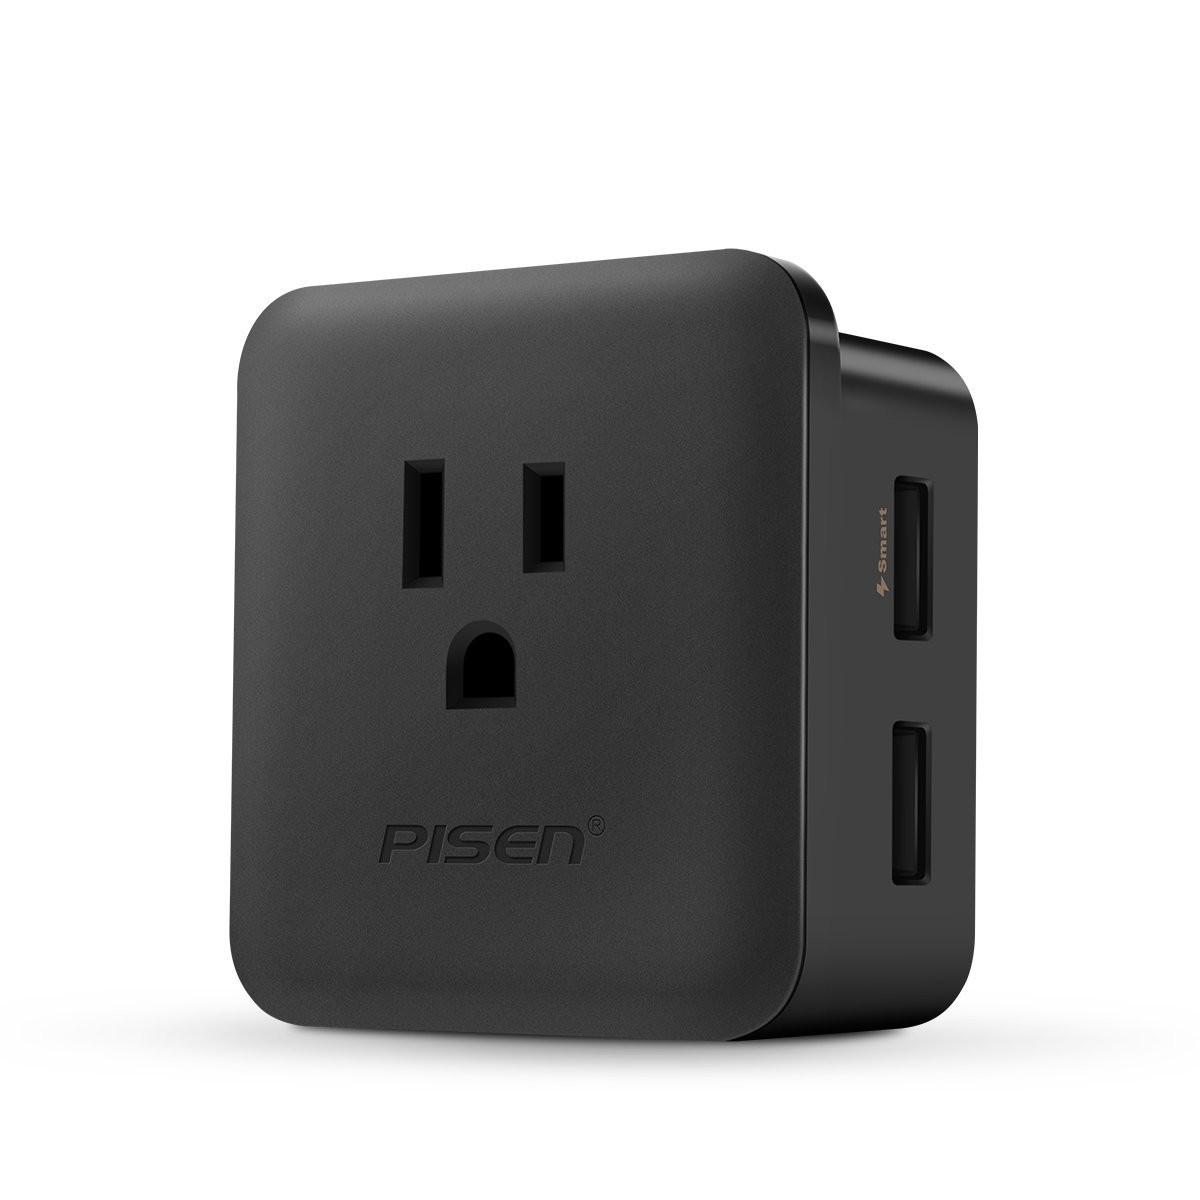 Pisen 2.4A Smart Charging Plug (US Socket)